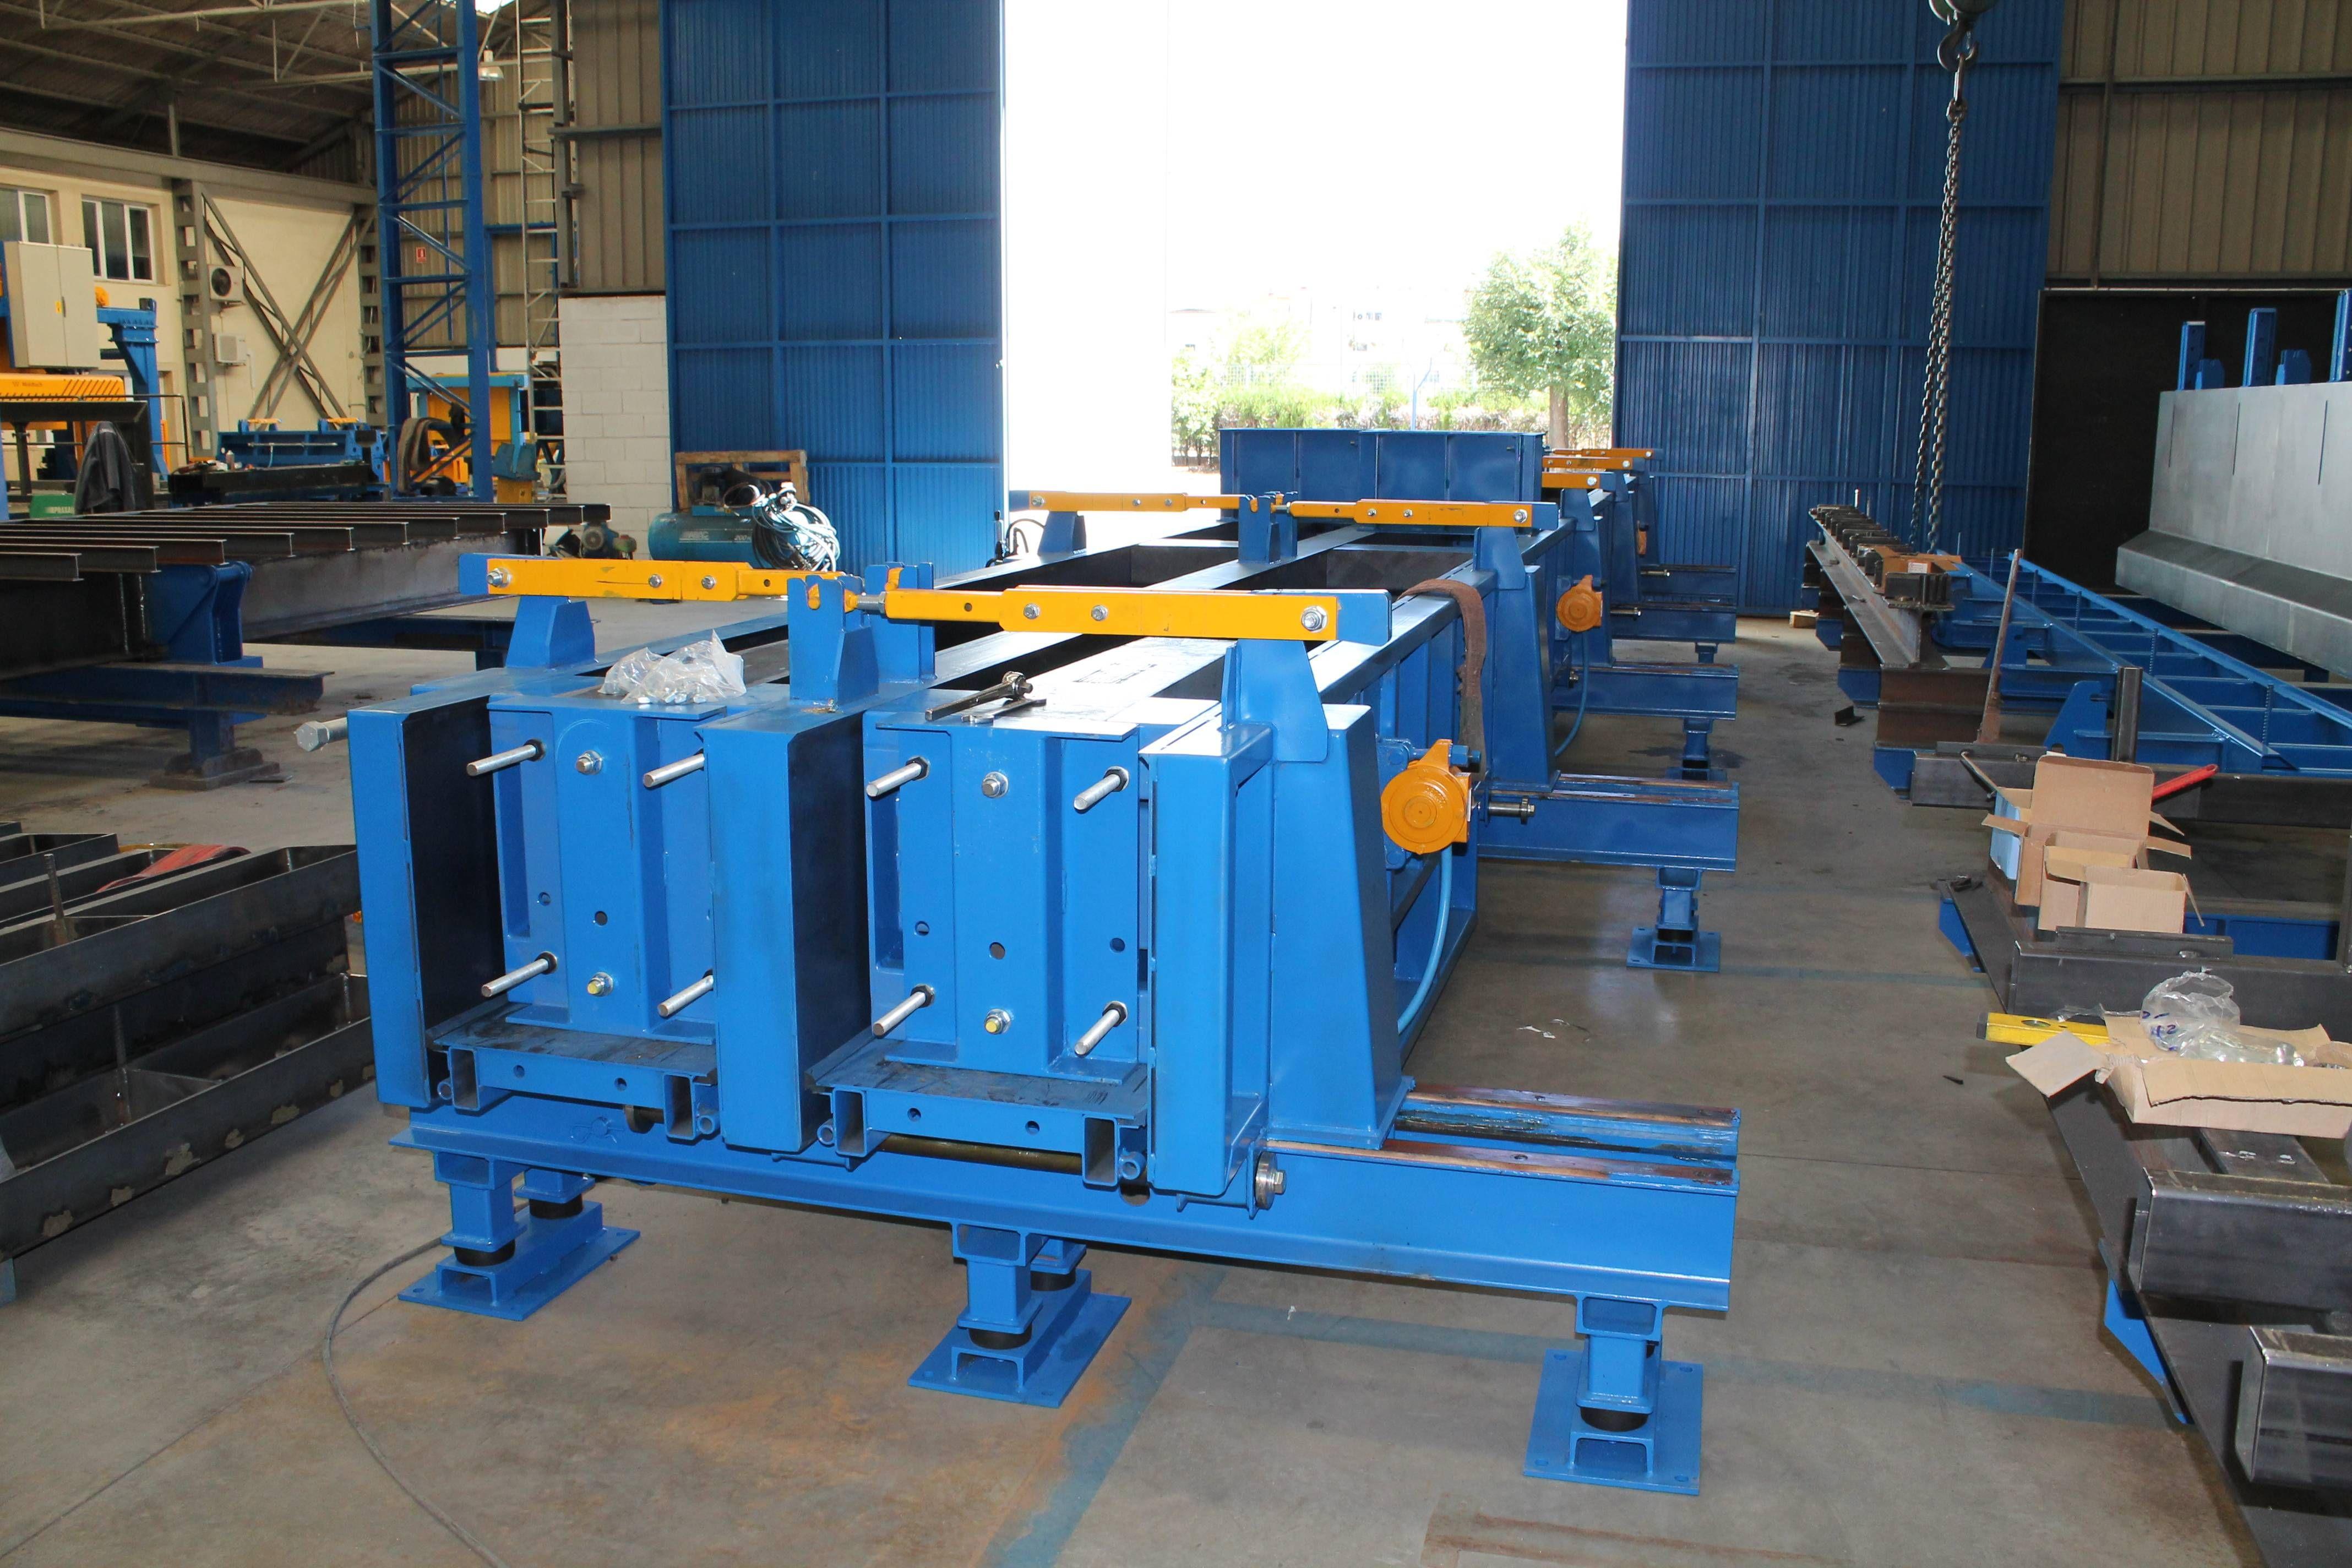 Moldtech is a leading manufacturer of precast concrete